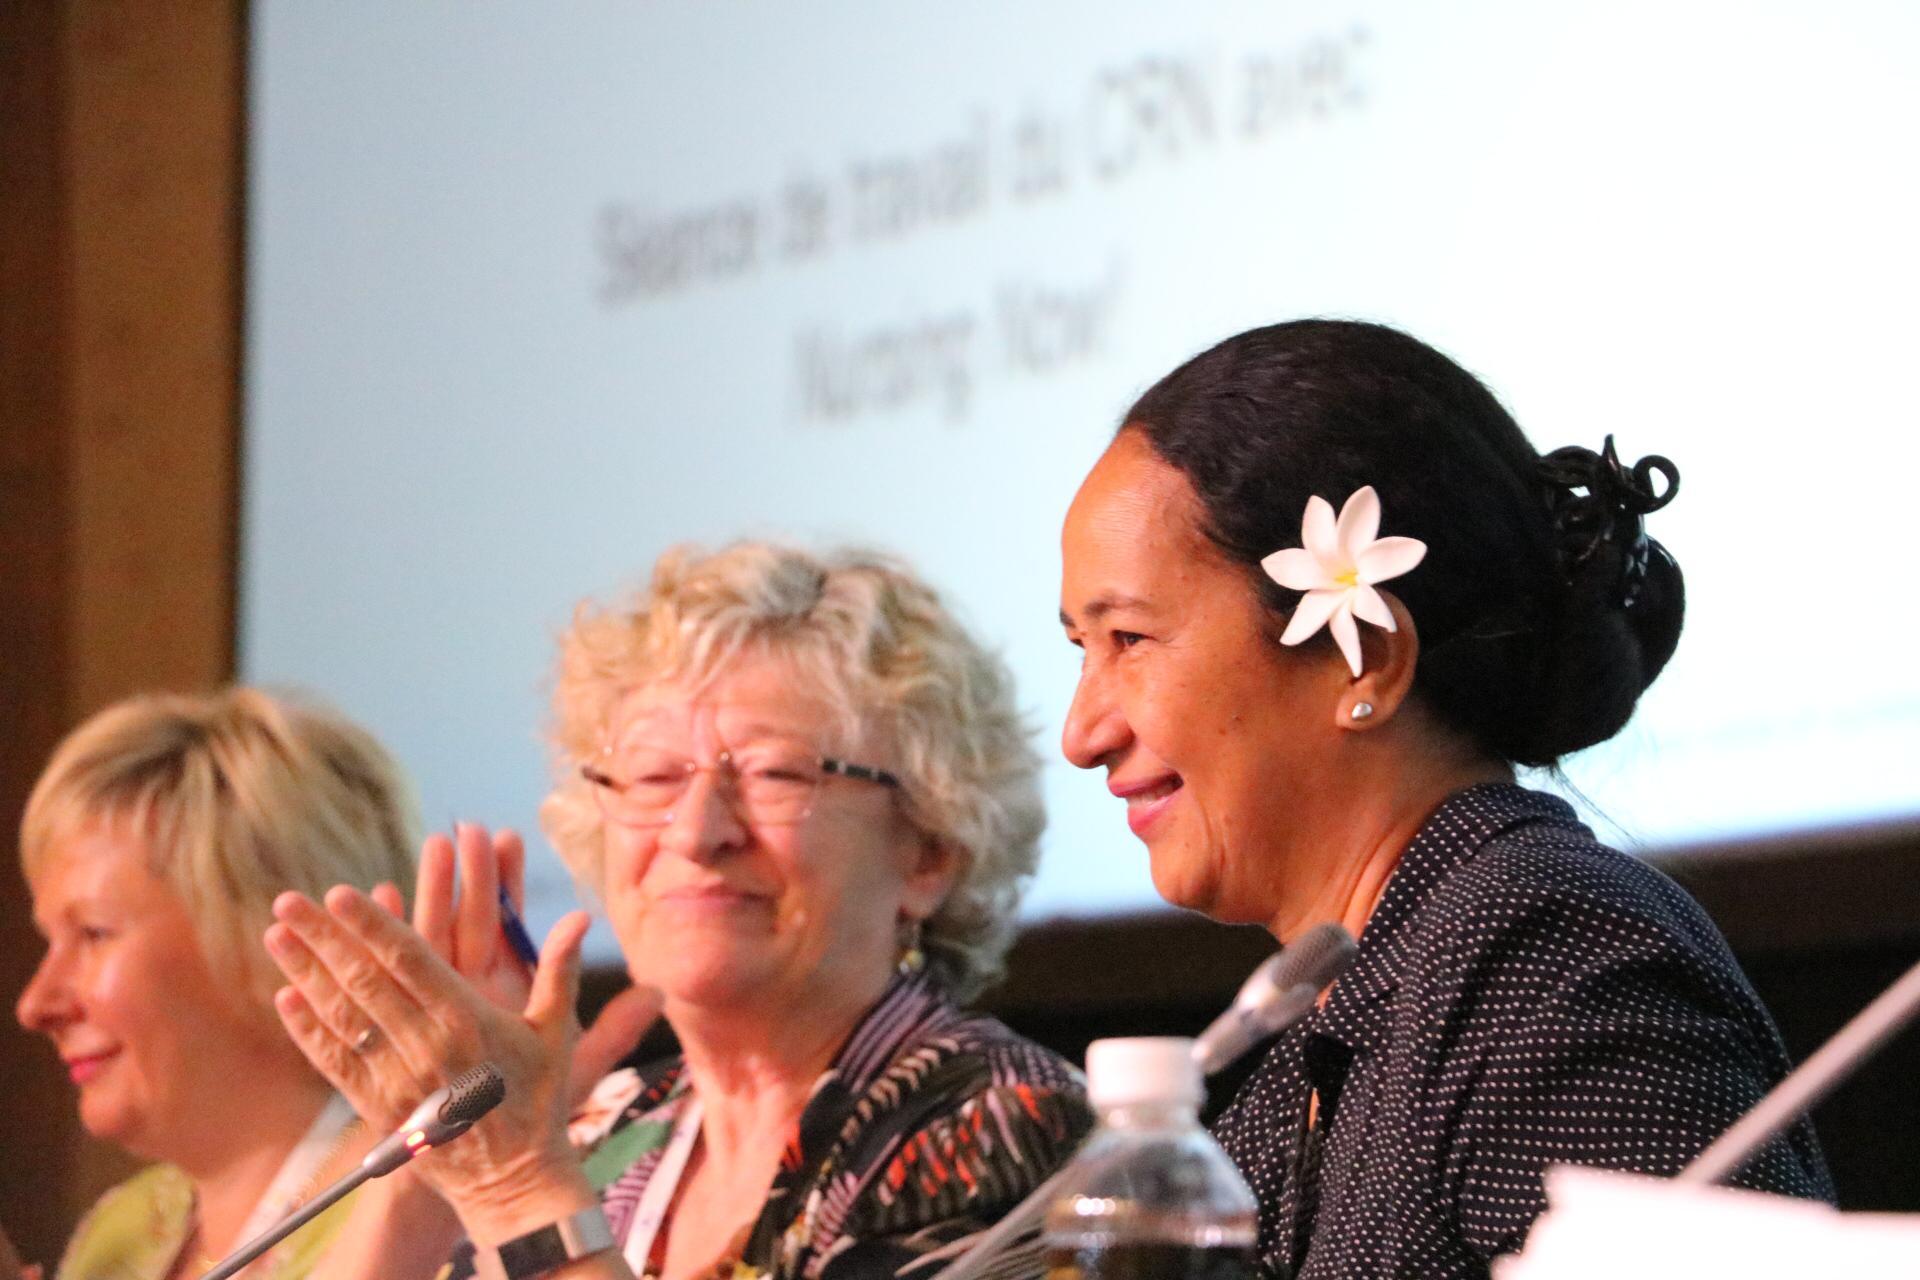 ICN Congress 2019 Singapore   ICN - International Council of Nurses